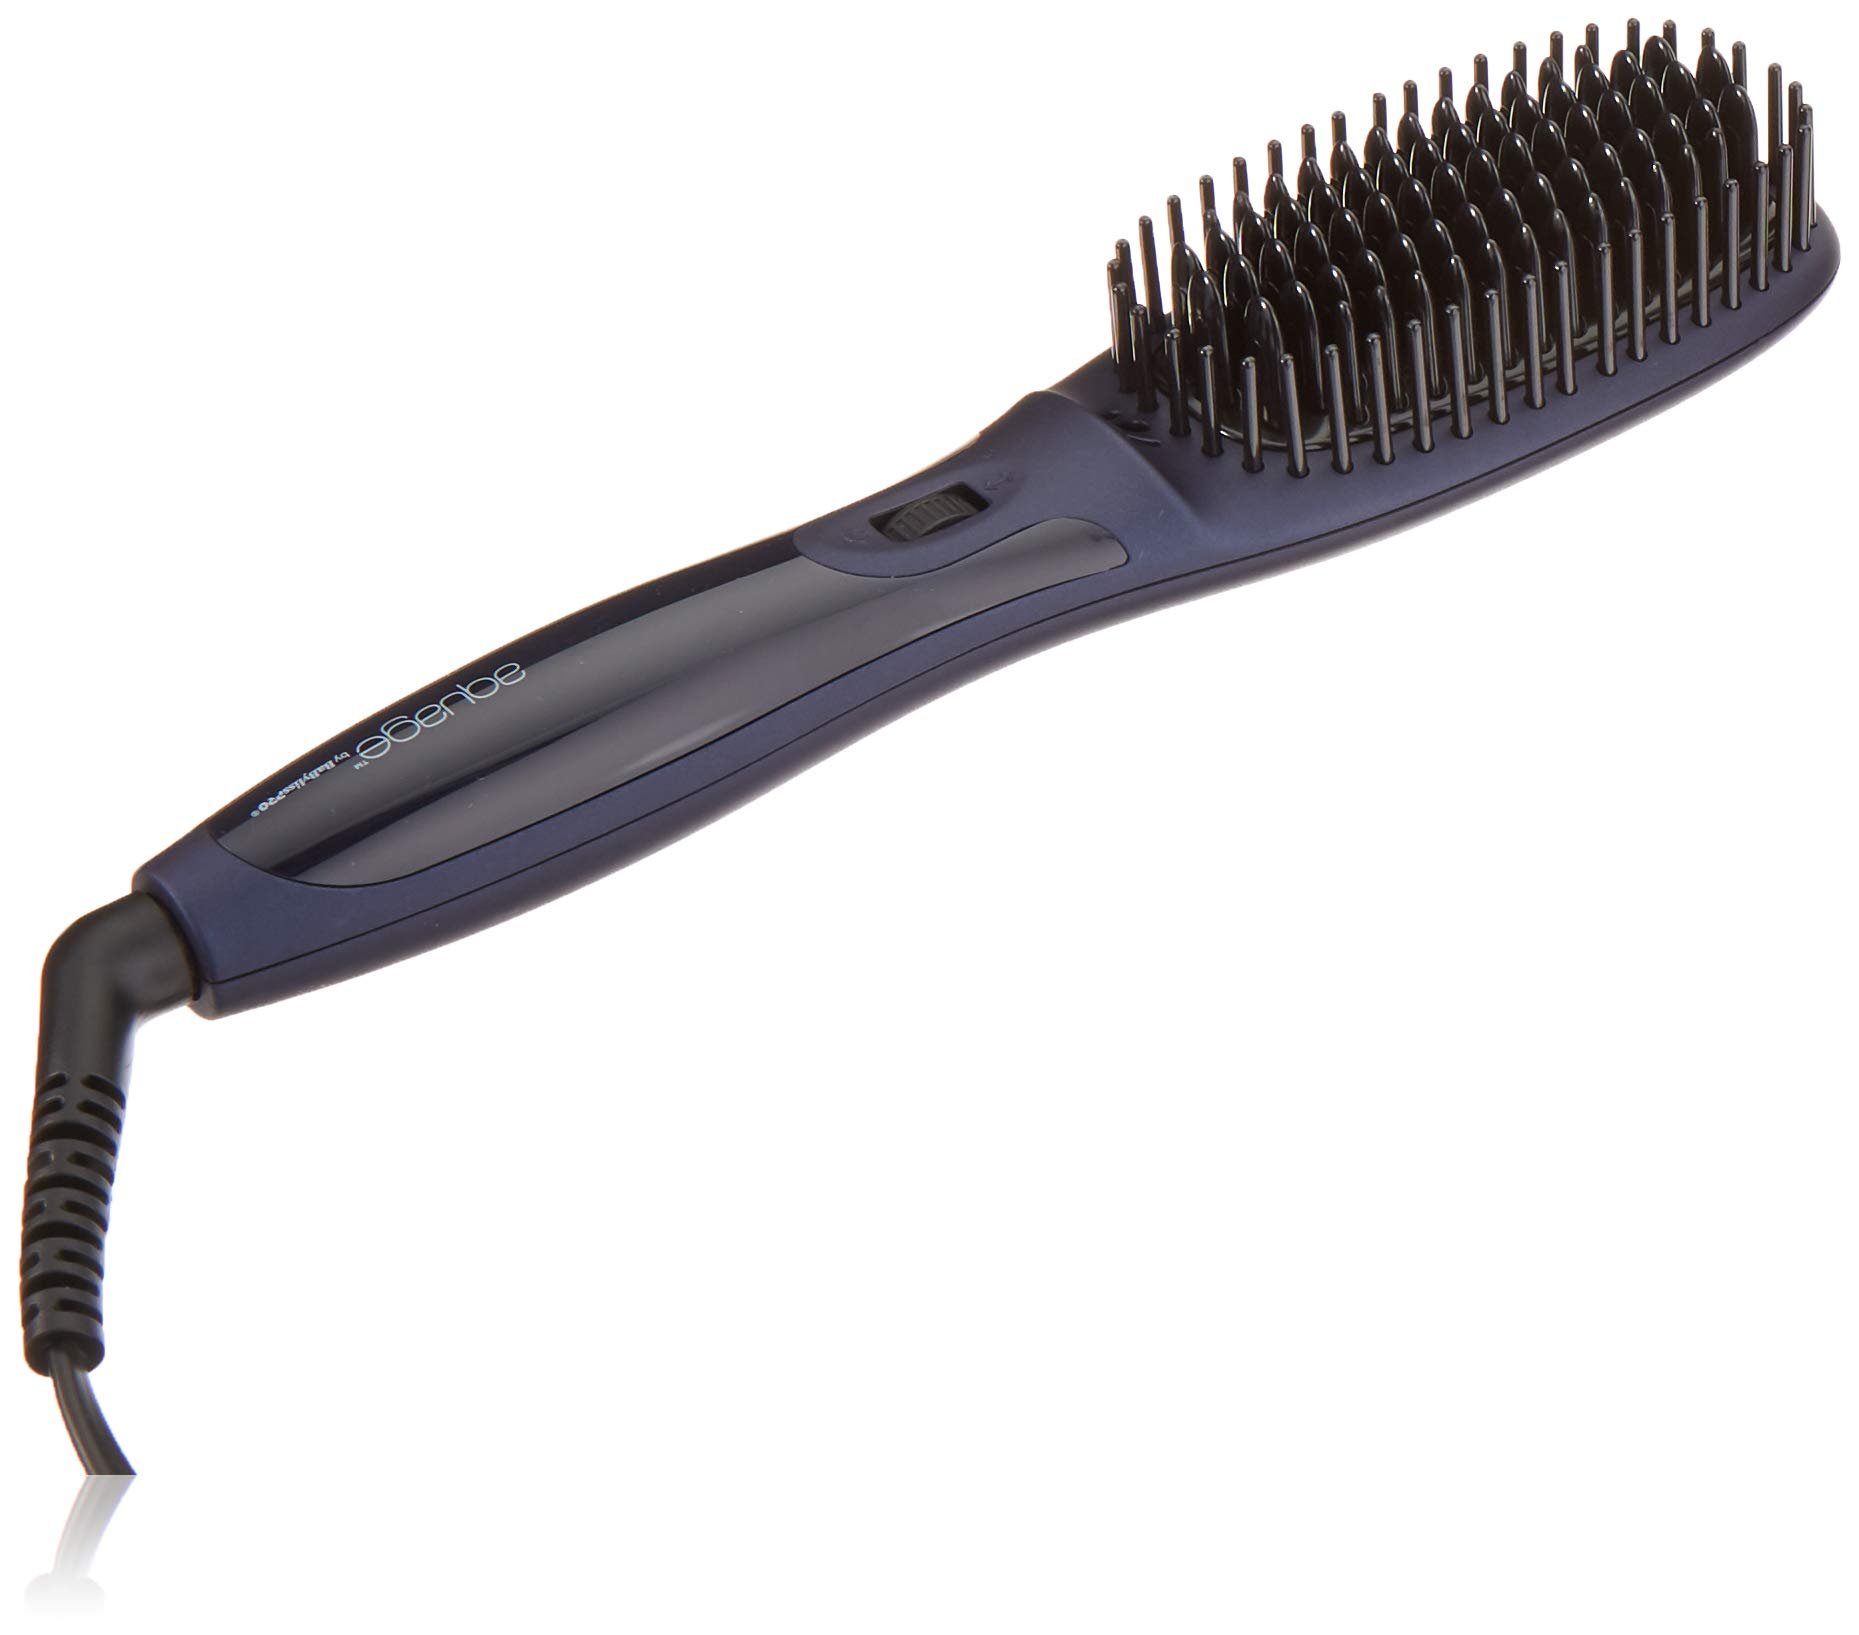 AQUAGE Ionic Thermal Paddle Brush